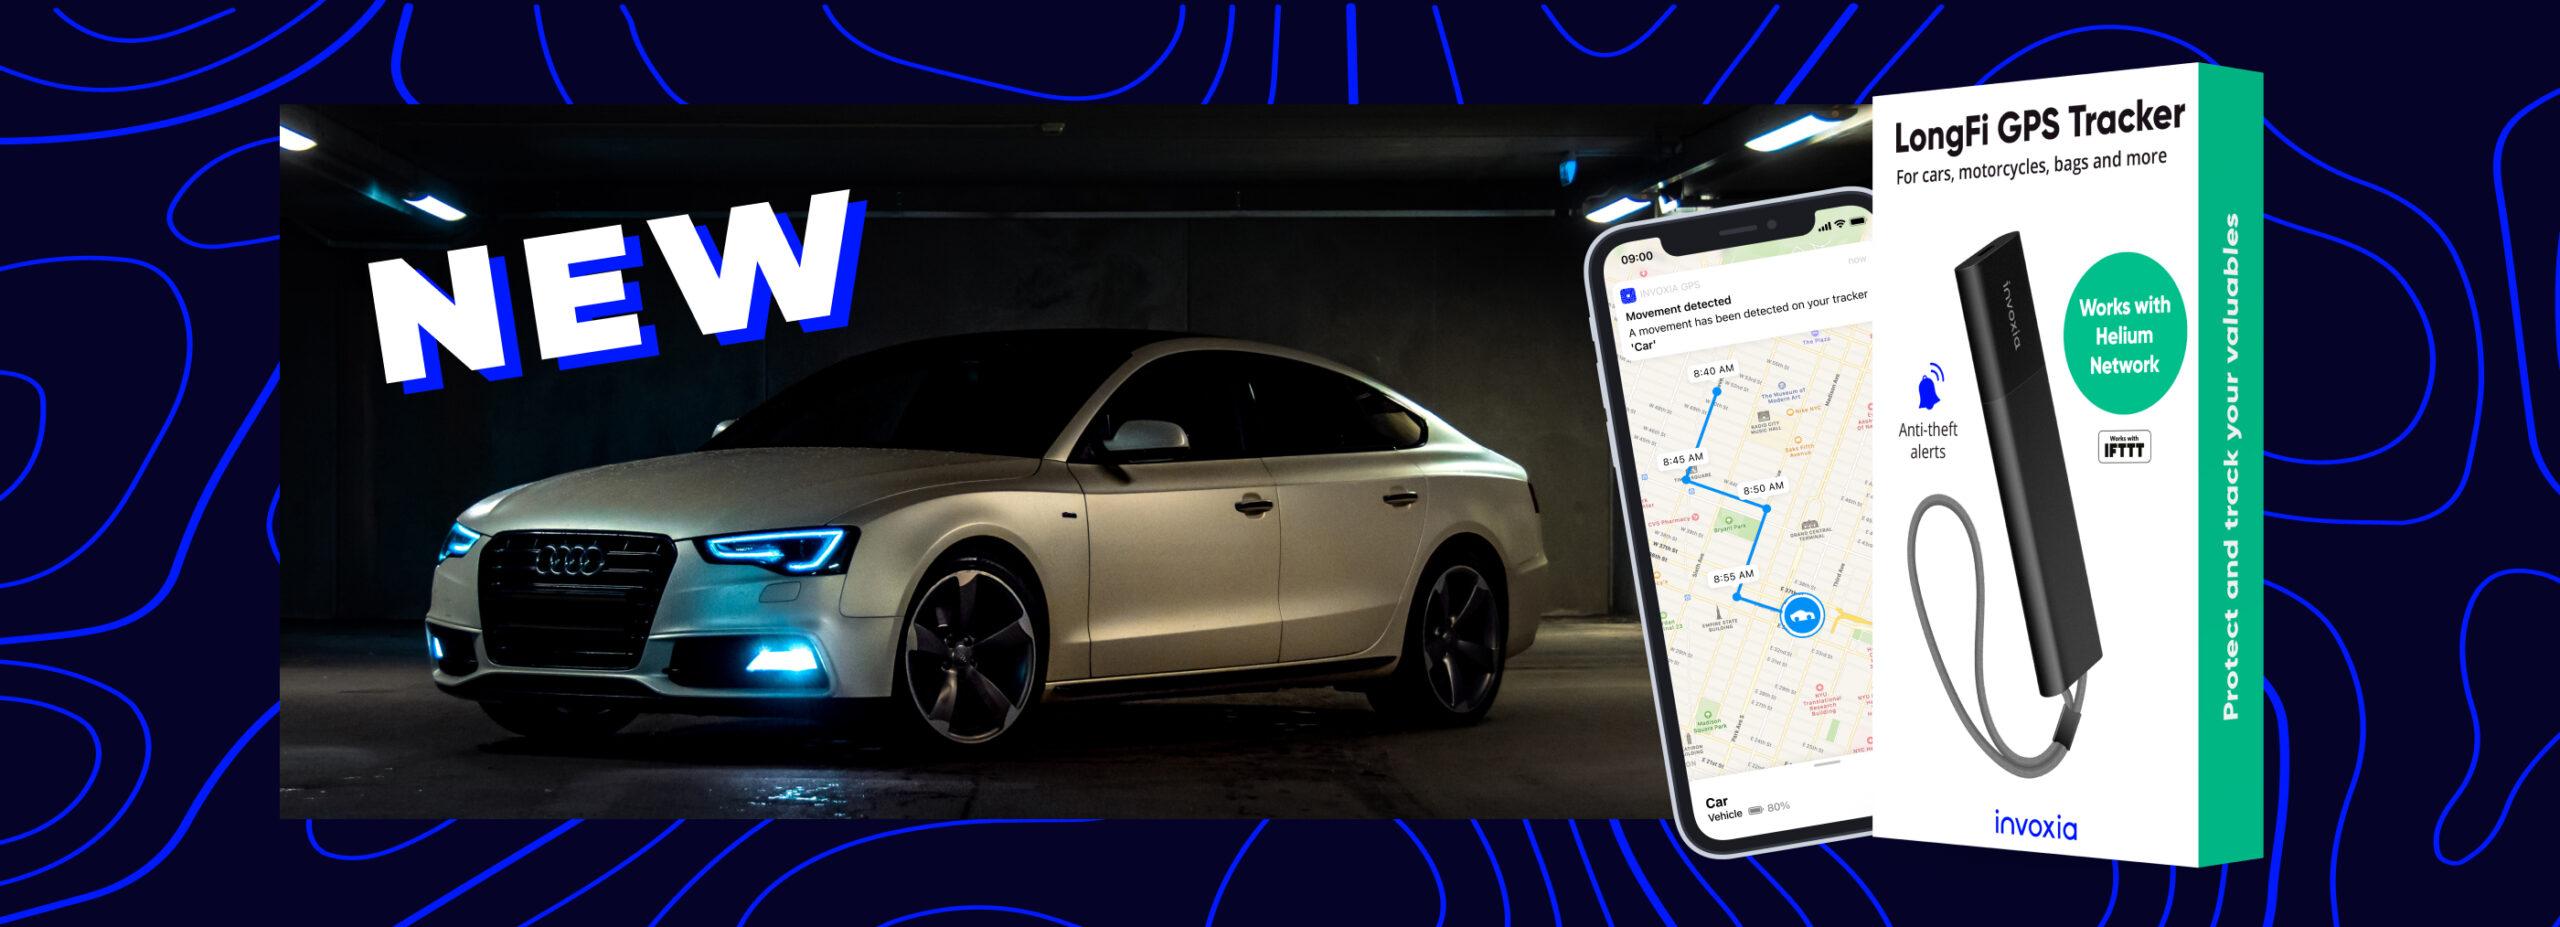 Invoxia LongFi GPS Tracker– New in the U.S.A.